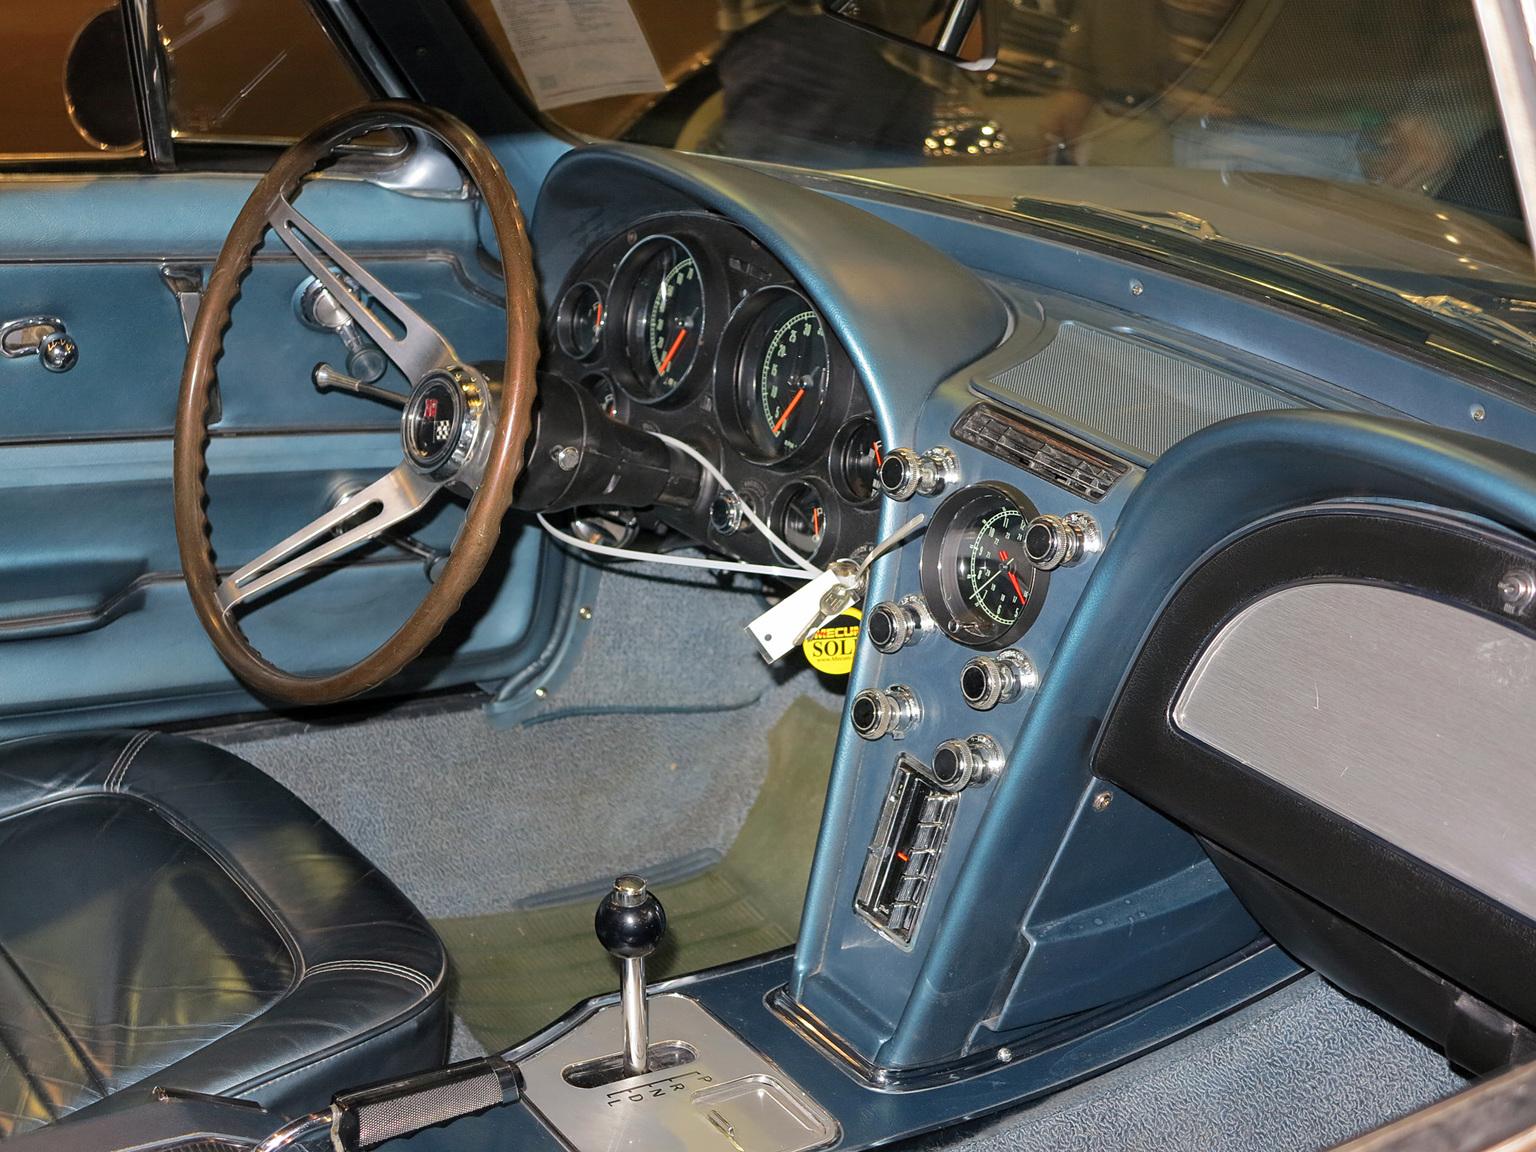 1967 Chevrolet Corvette Sting Ray L68 427/400 HP Gallery